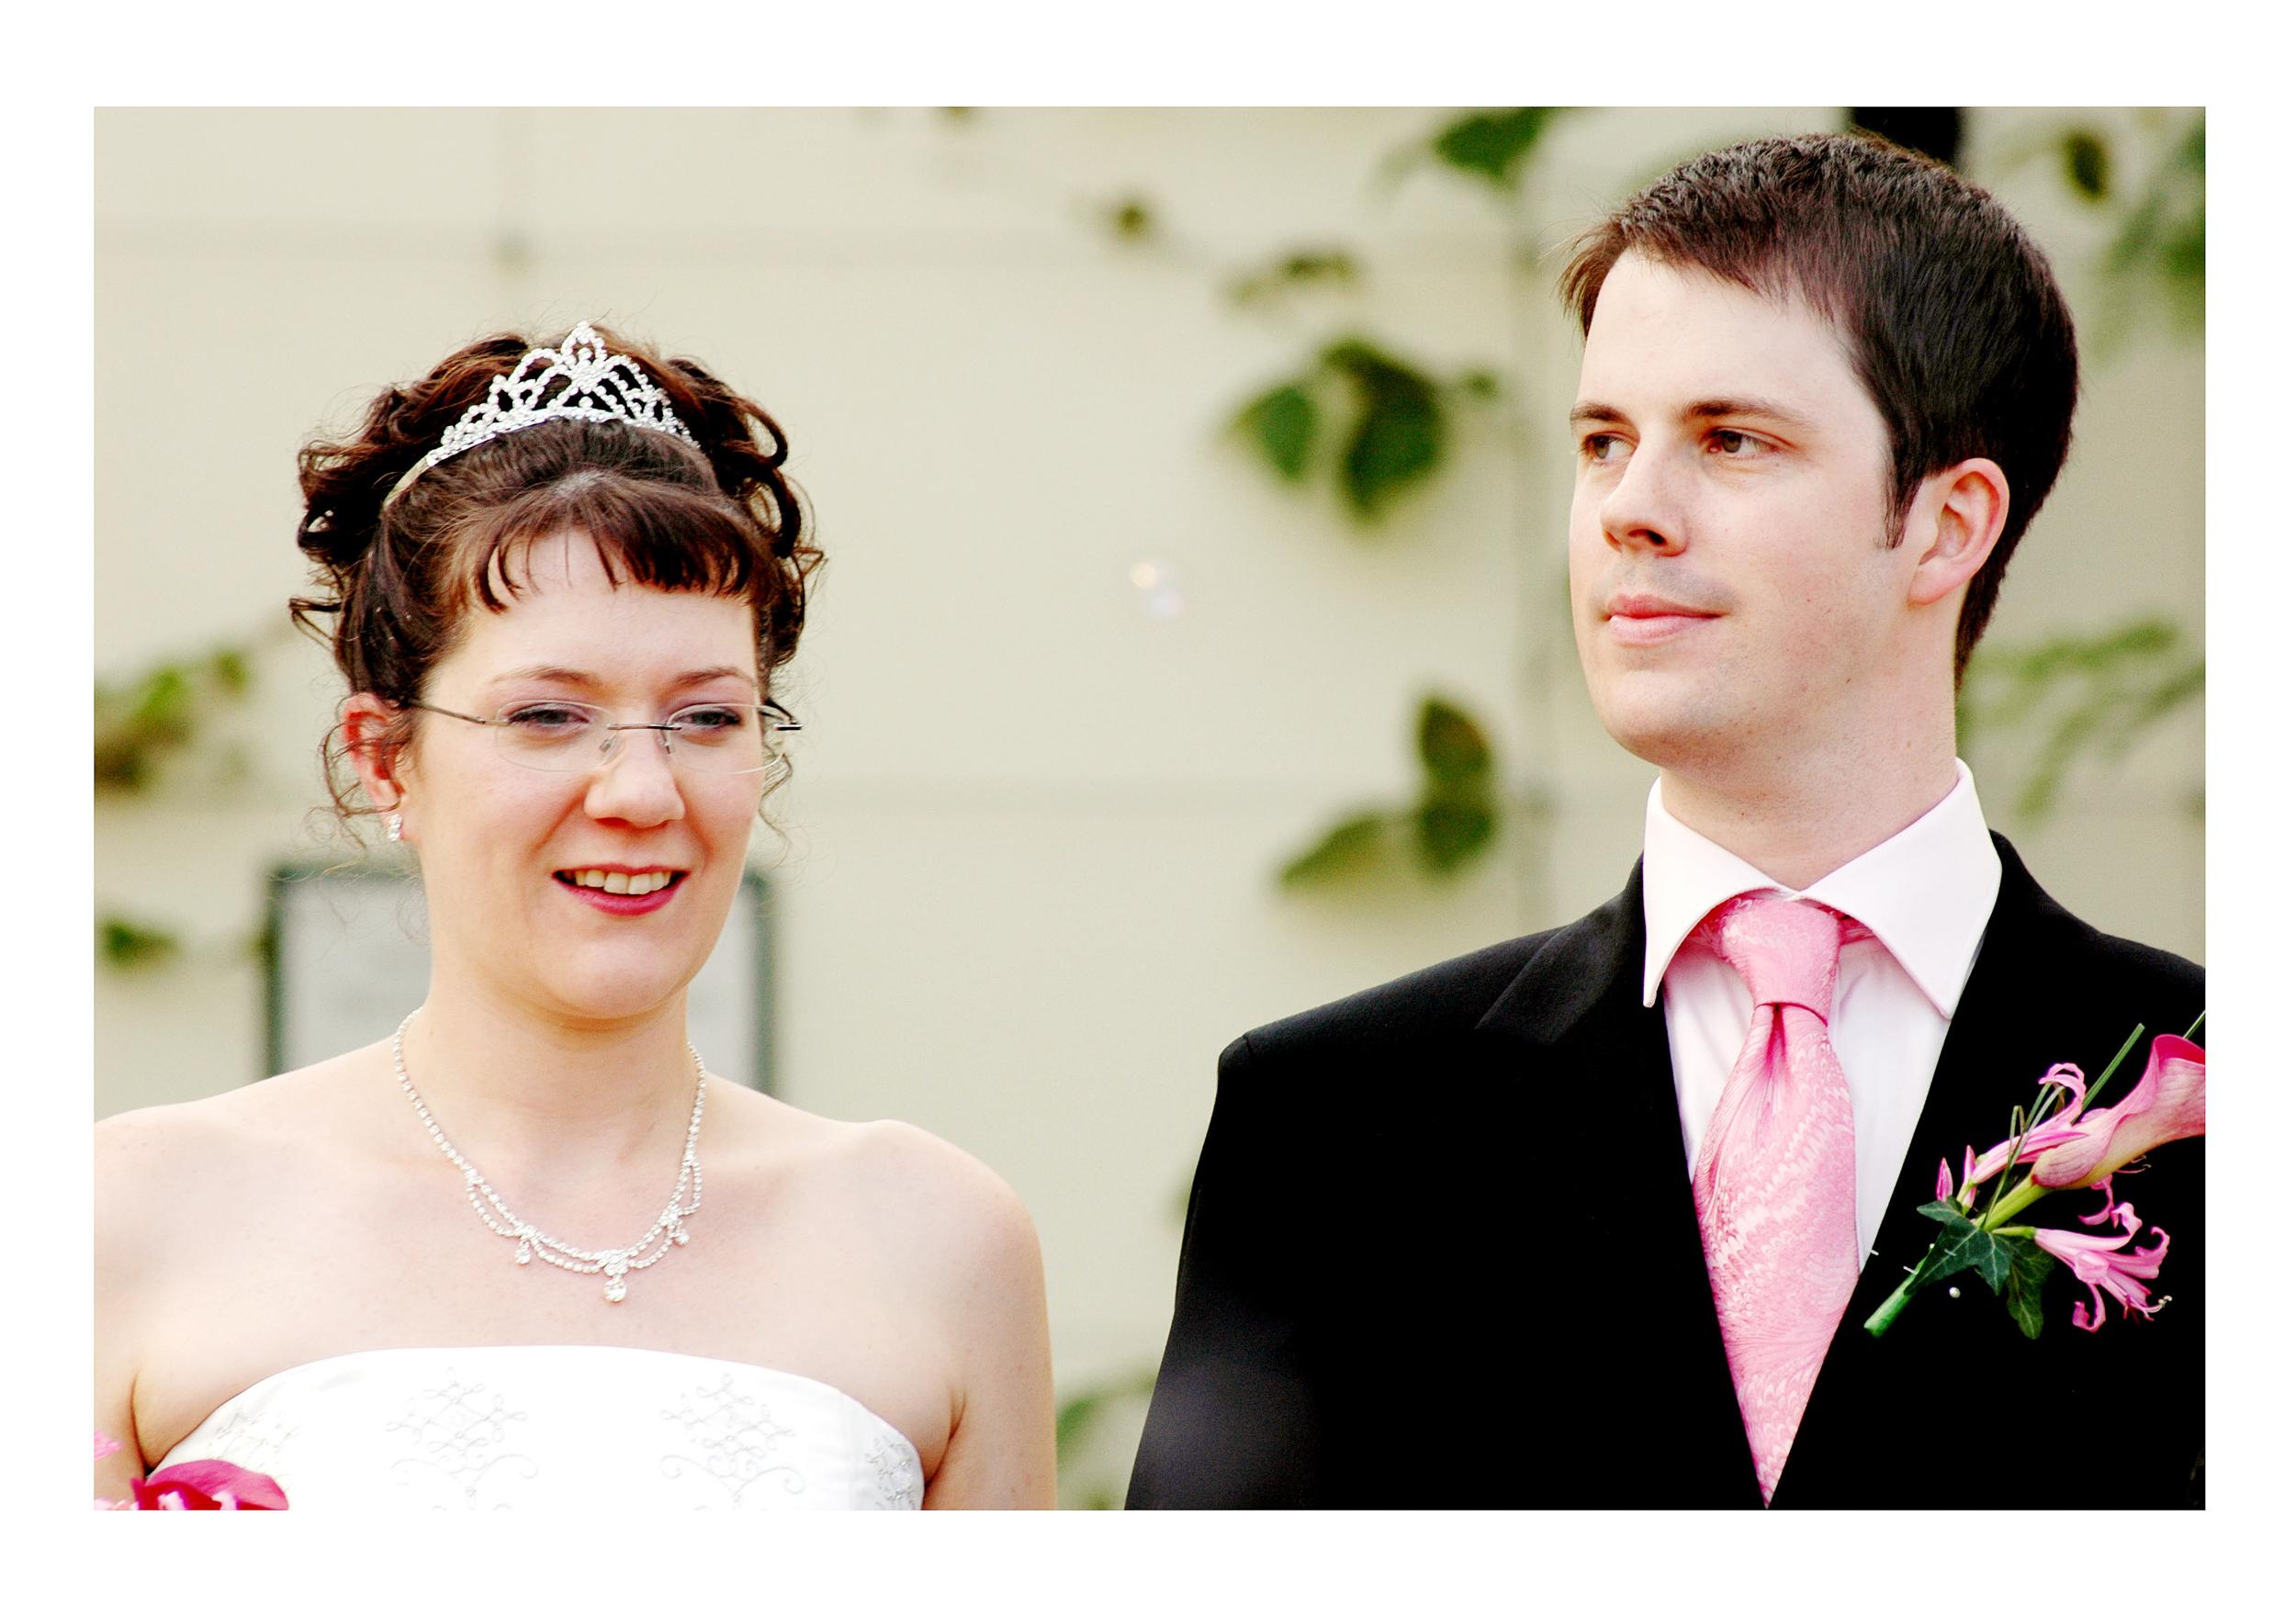 REPORTAGE-WEDDING-PHOTOGRAPHY-SET-UK-25.jpg